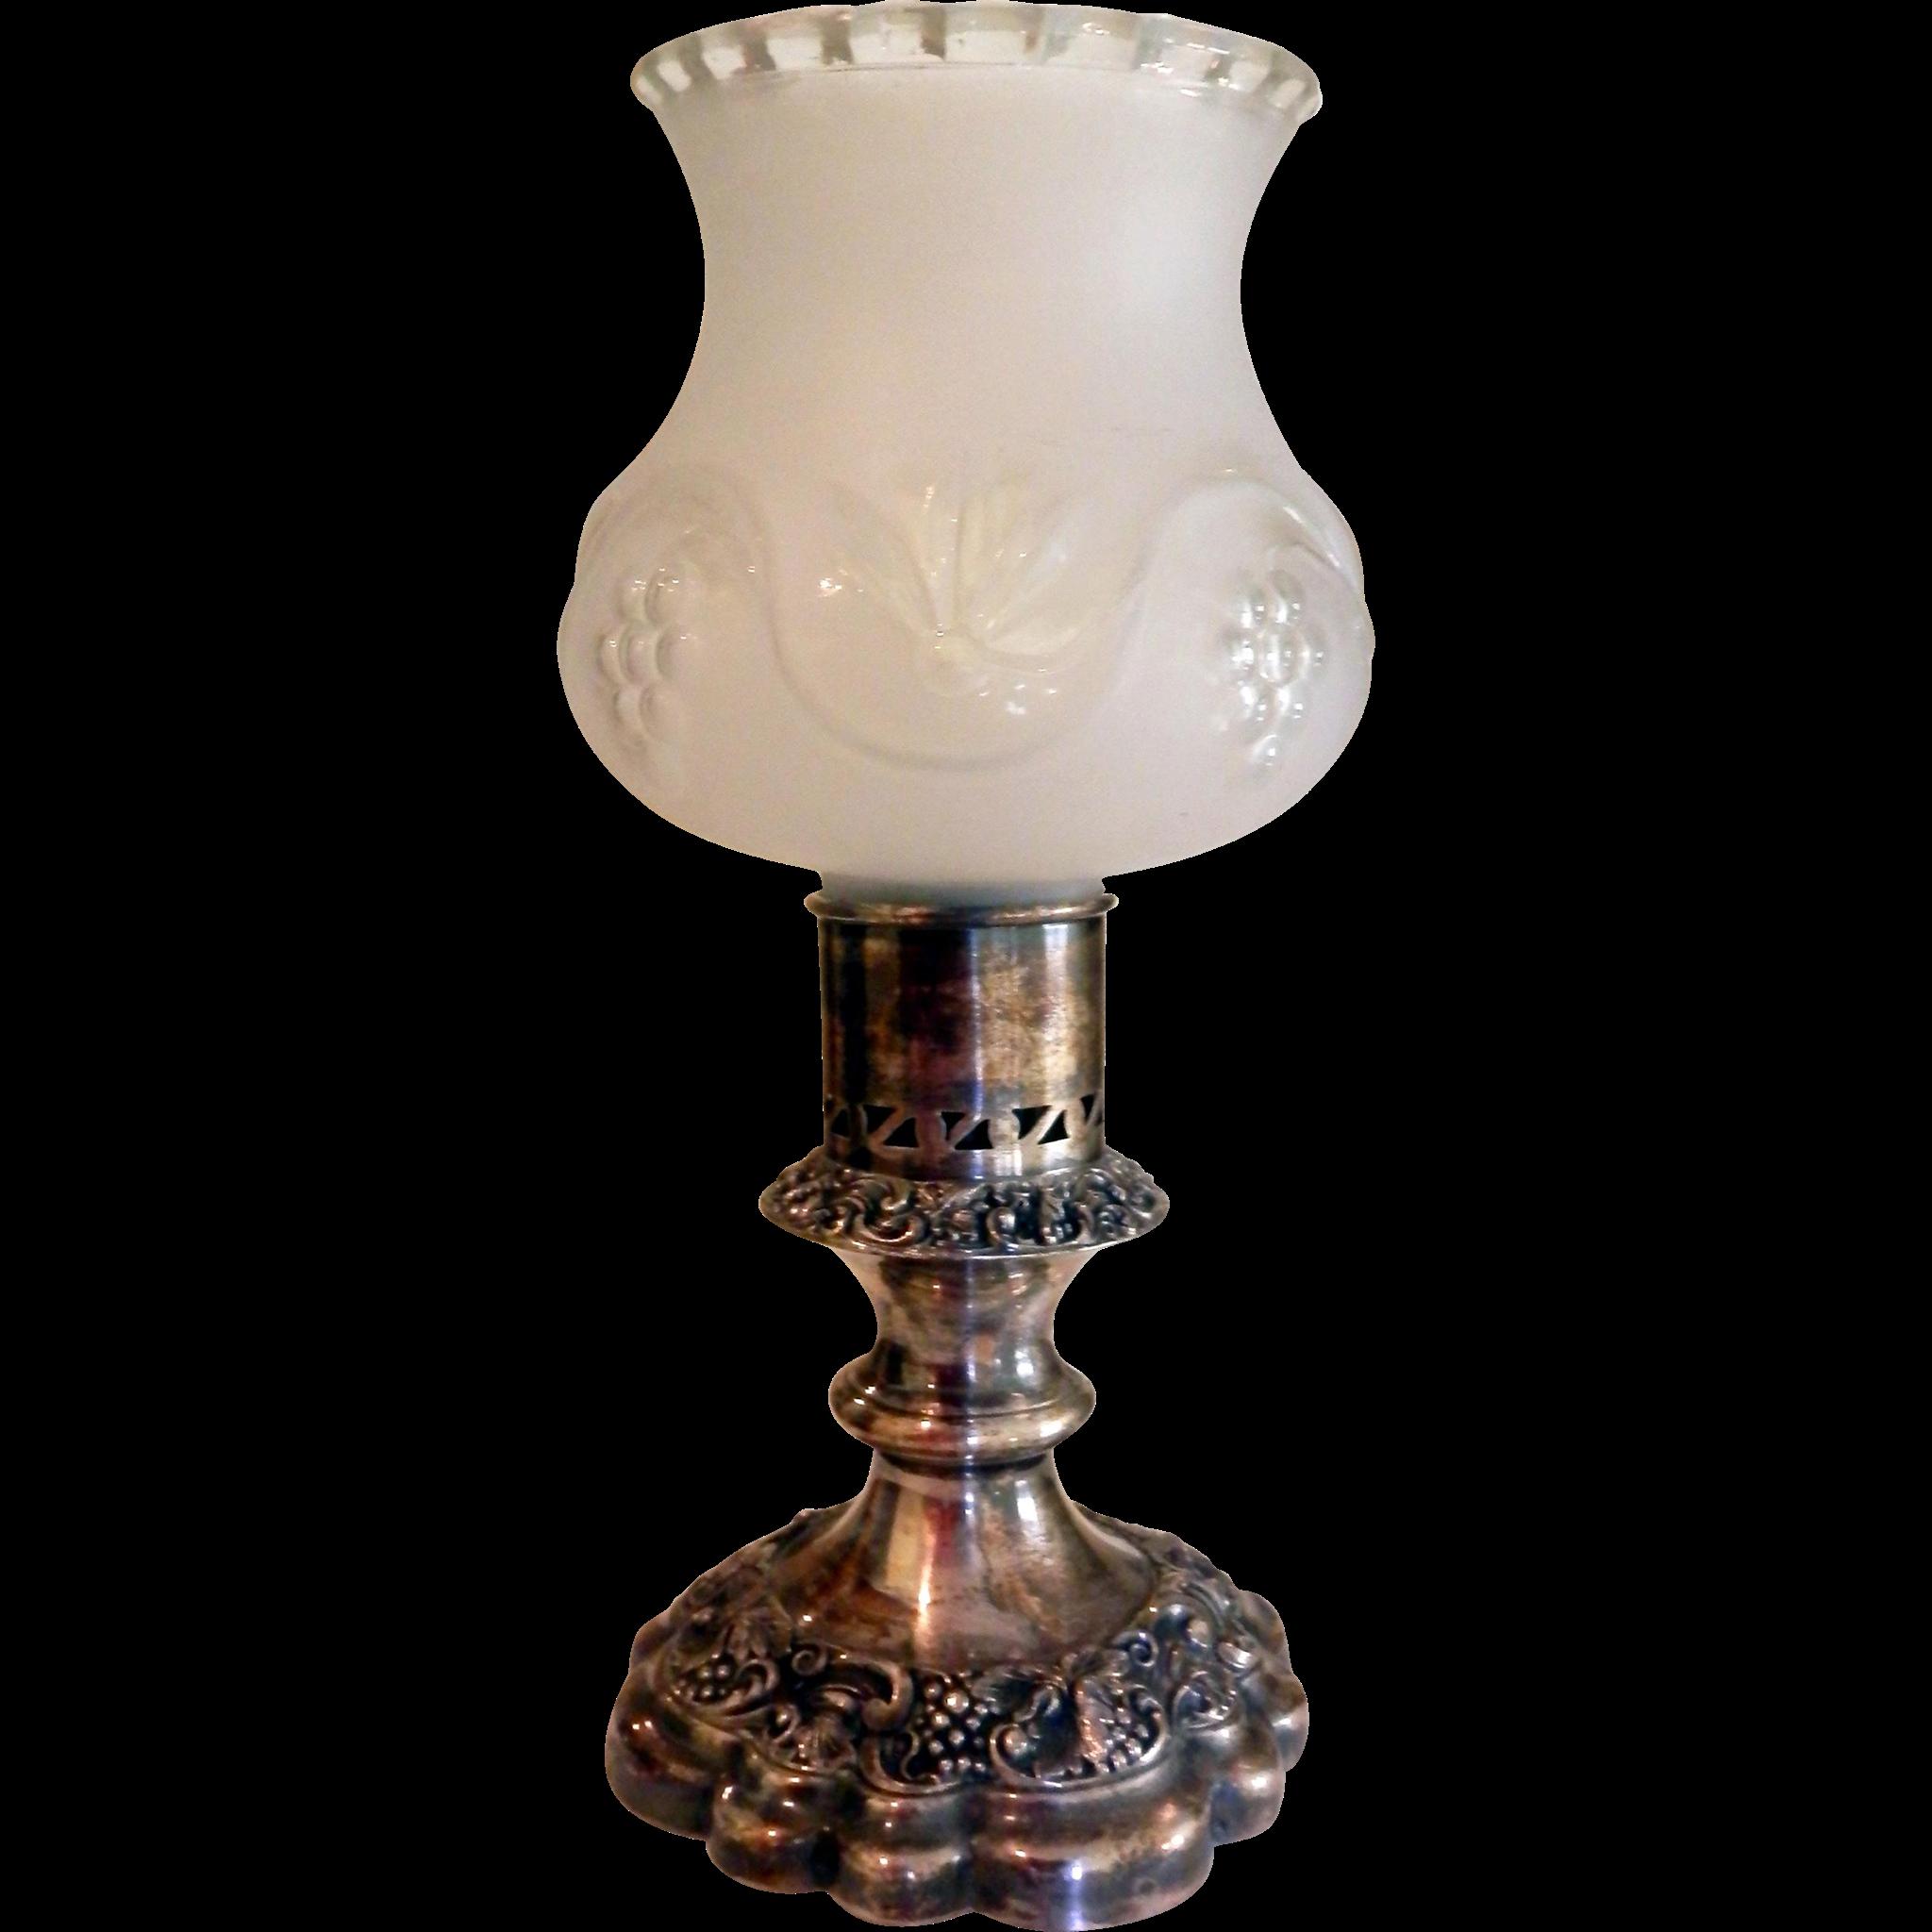 Ellis-Barker Silver Plated Hurricane or Boudoir Lamp Candle Stick ...